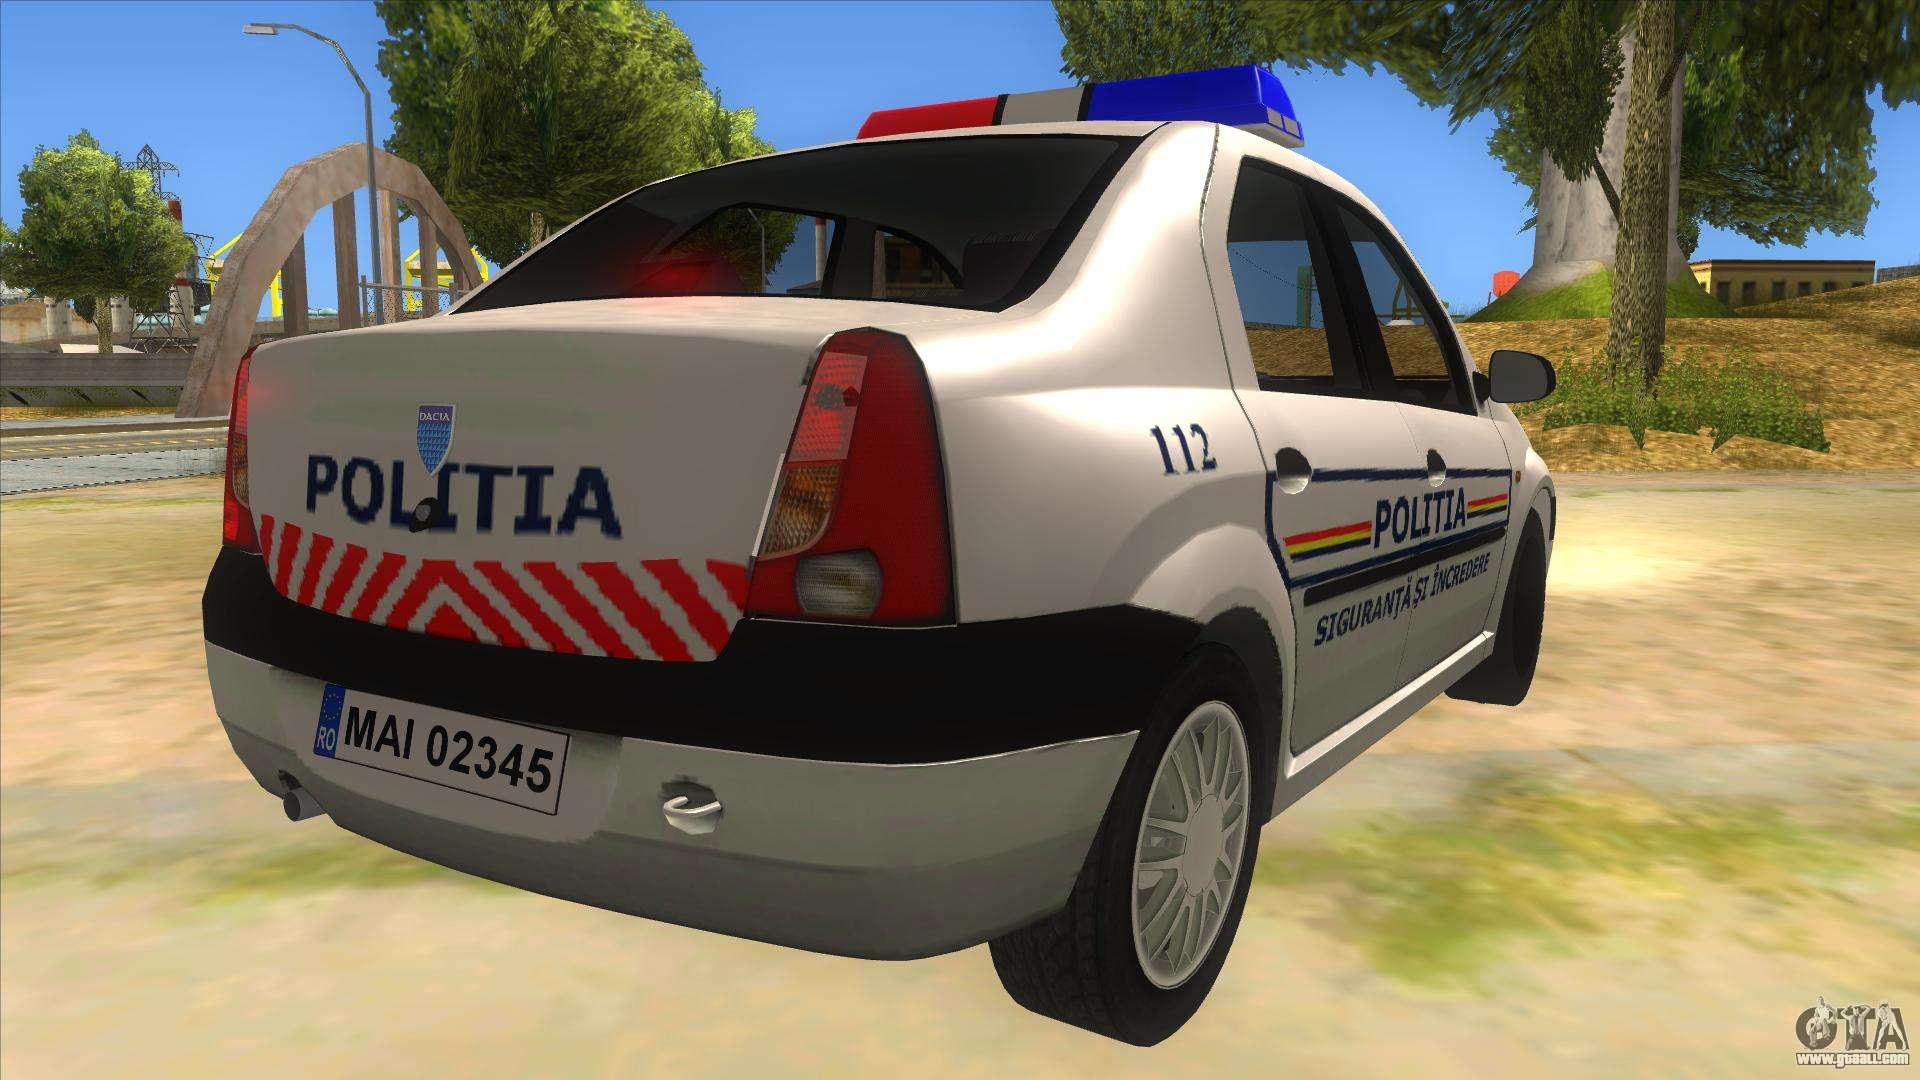 image Dacia logan romanian 50 plus milf